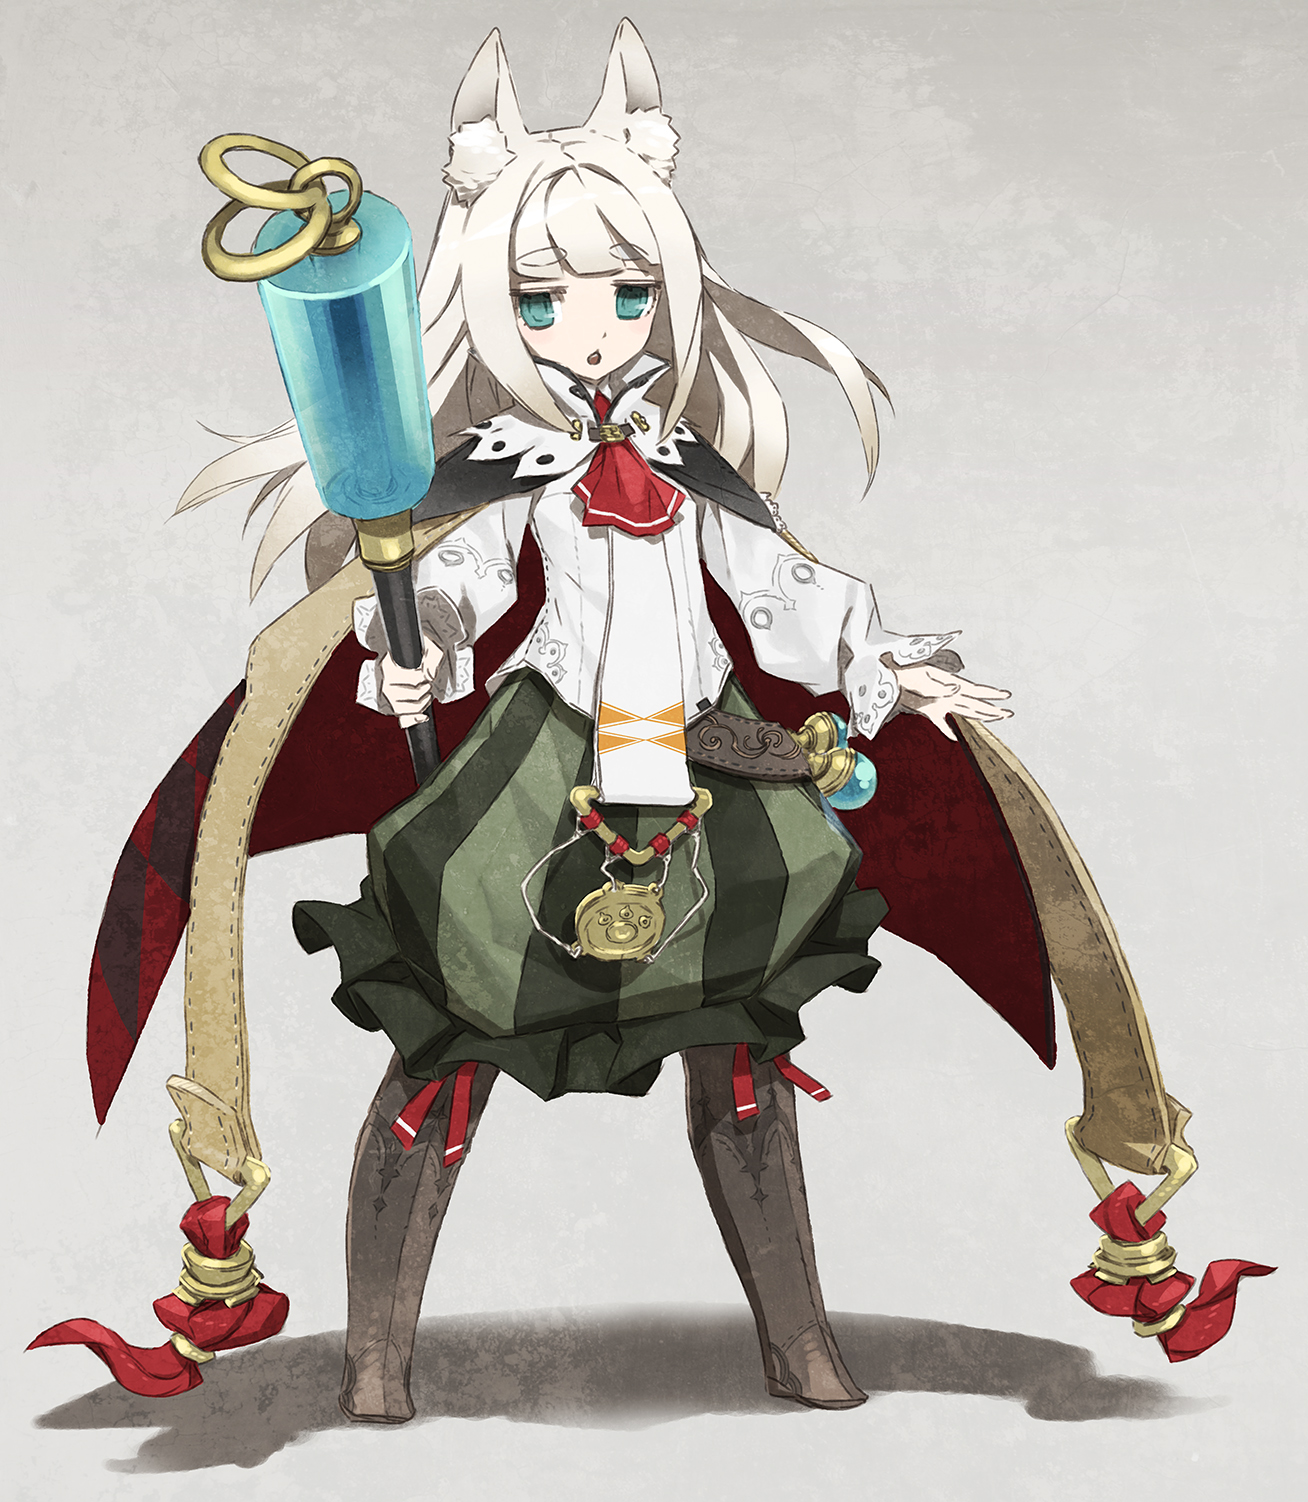 Mage 7th dragon zerochan anime image board